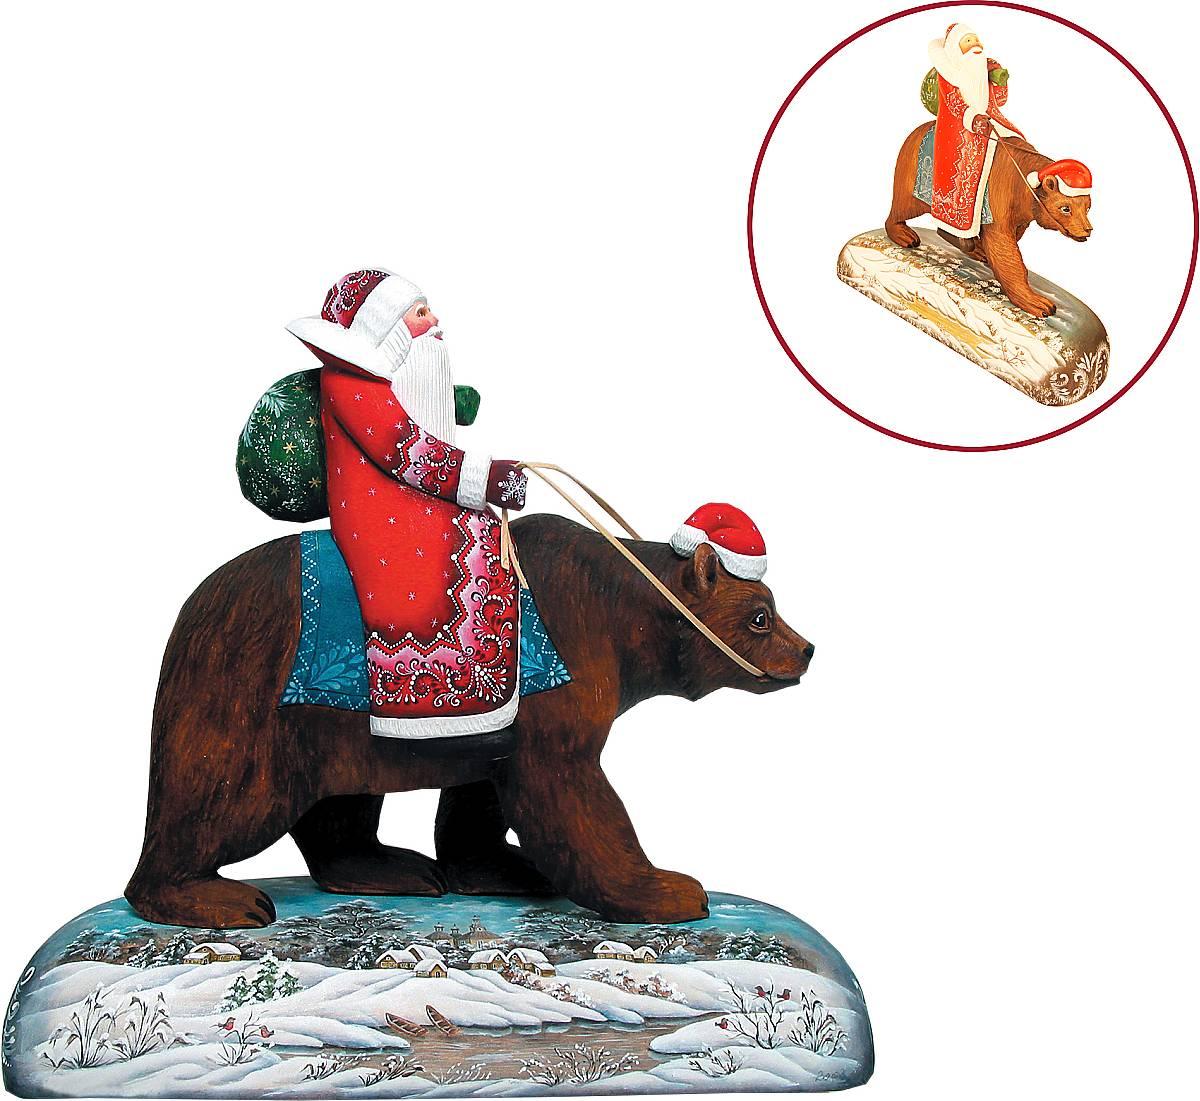 "Игрушка новогодняя коллекционная ""Дед Мороз на буром медведе"" US 51128"